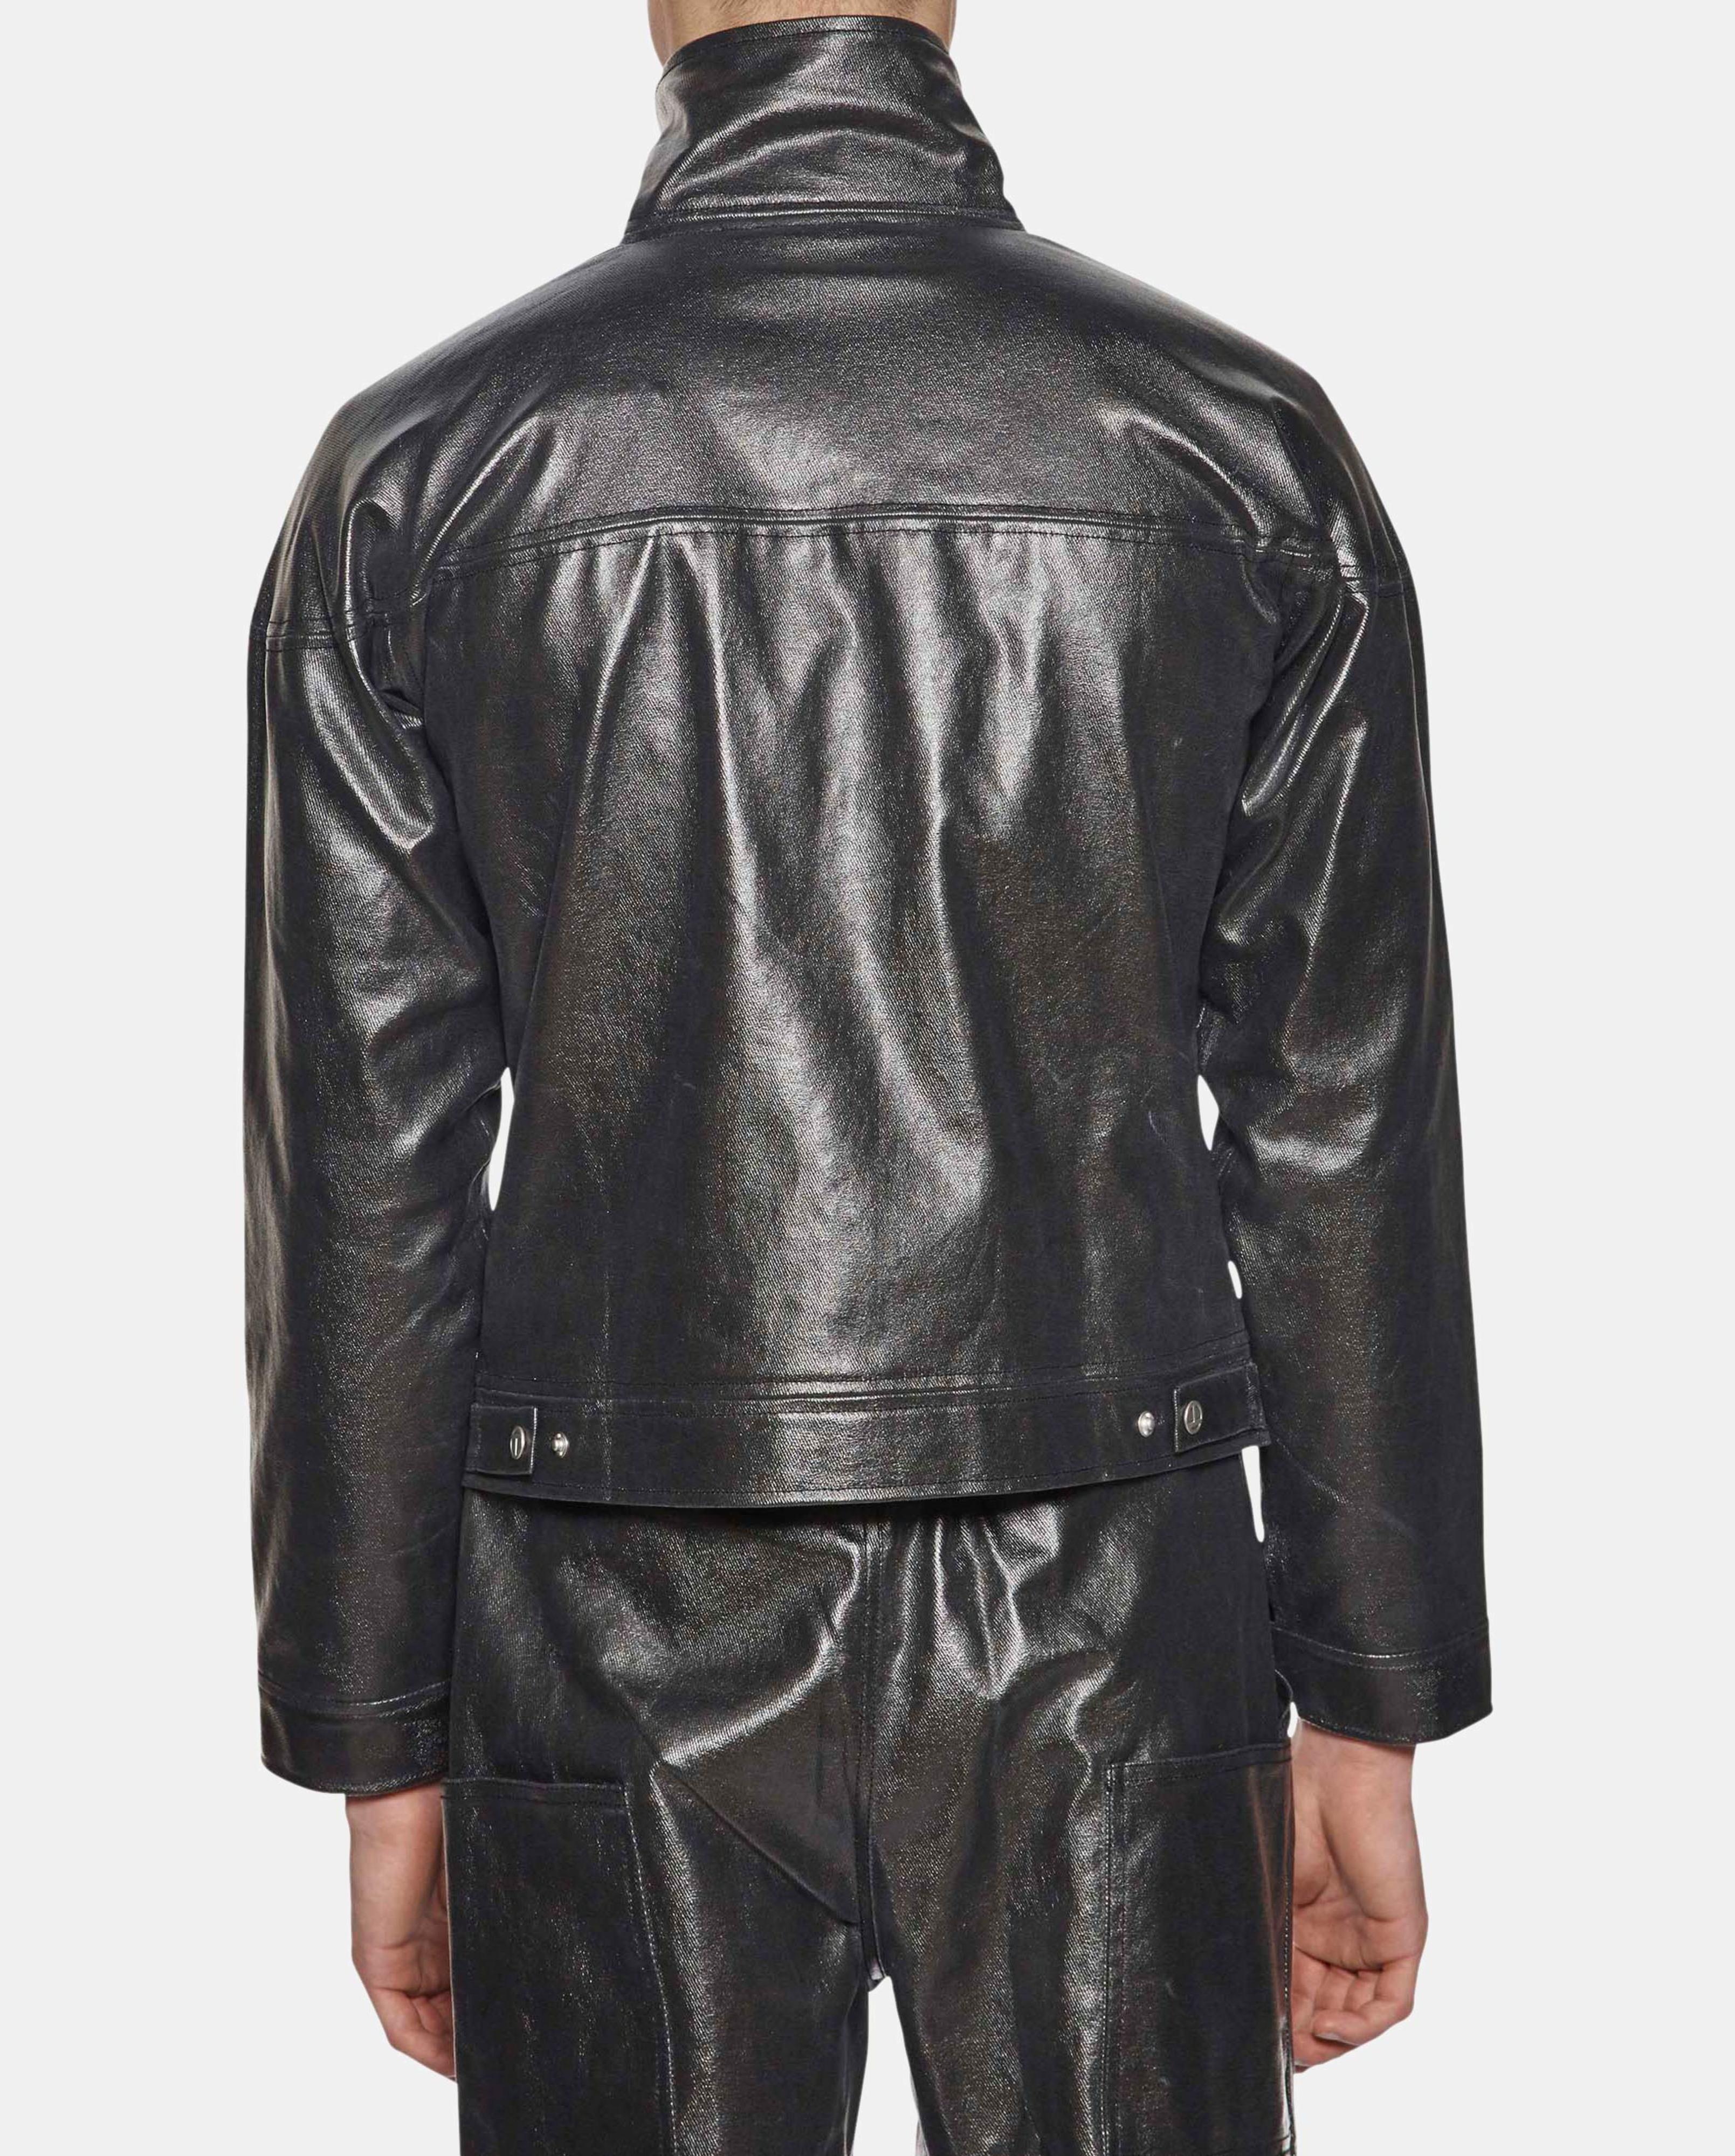 Telfar Drop Shoulder Denim Jacket for Men